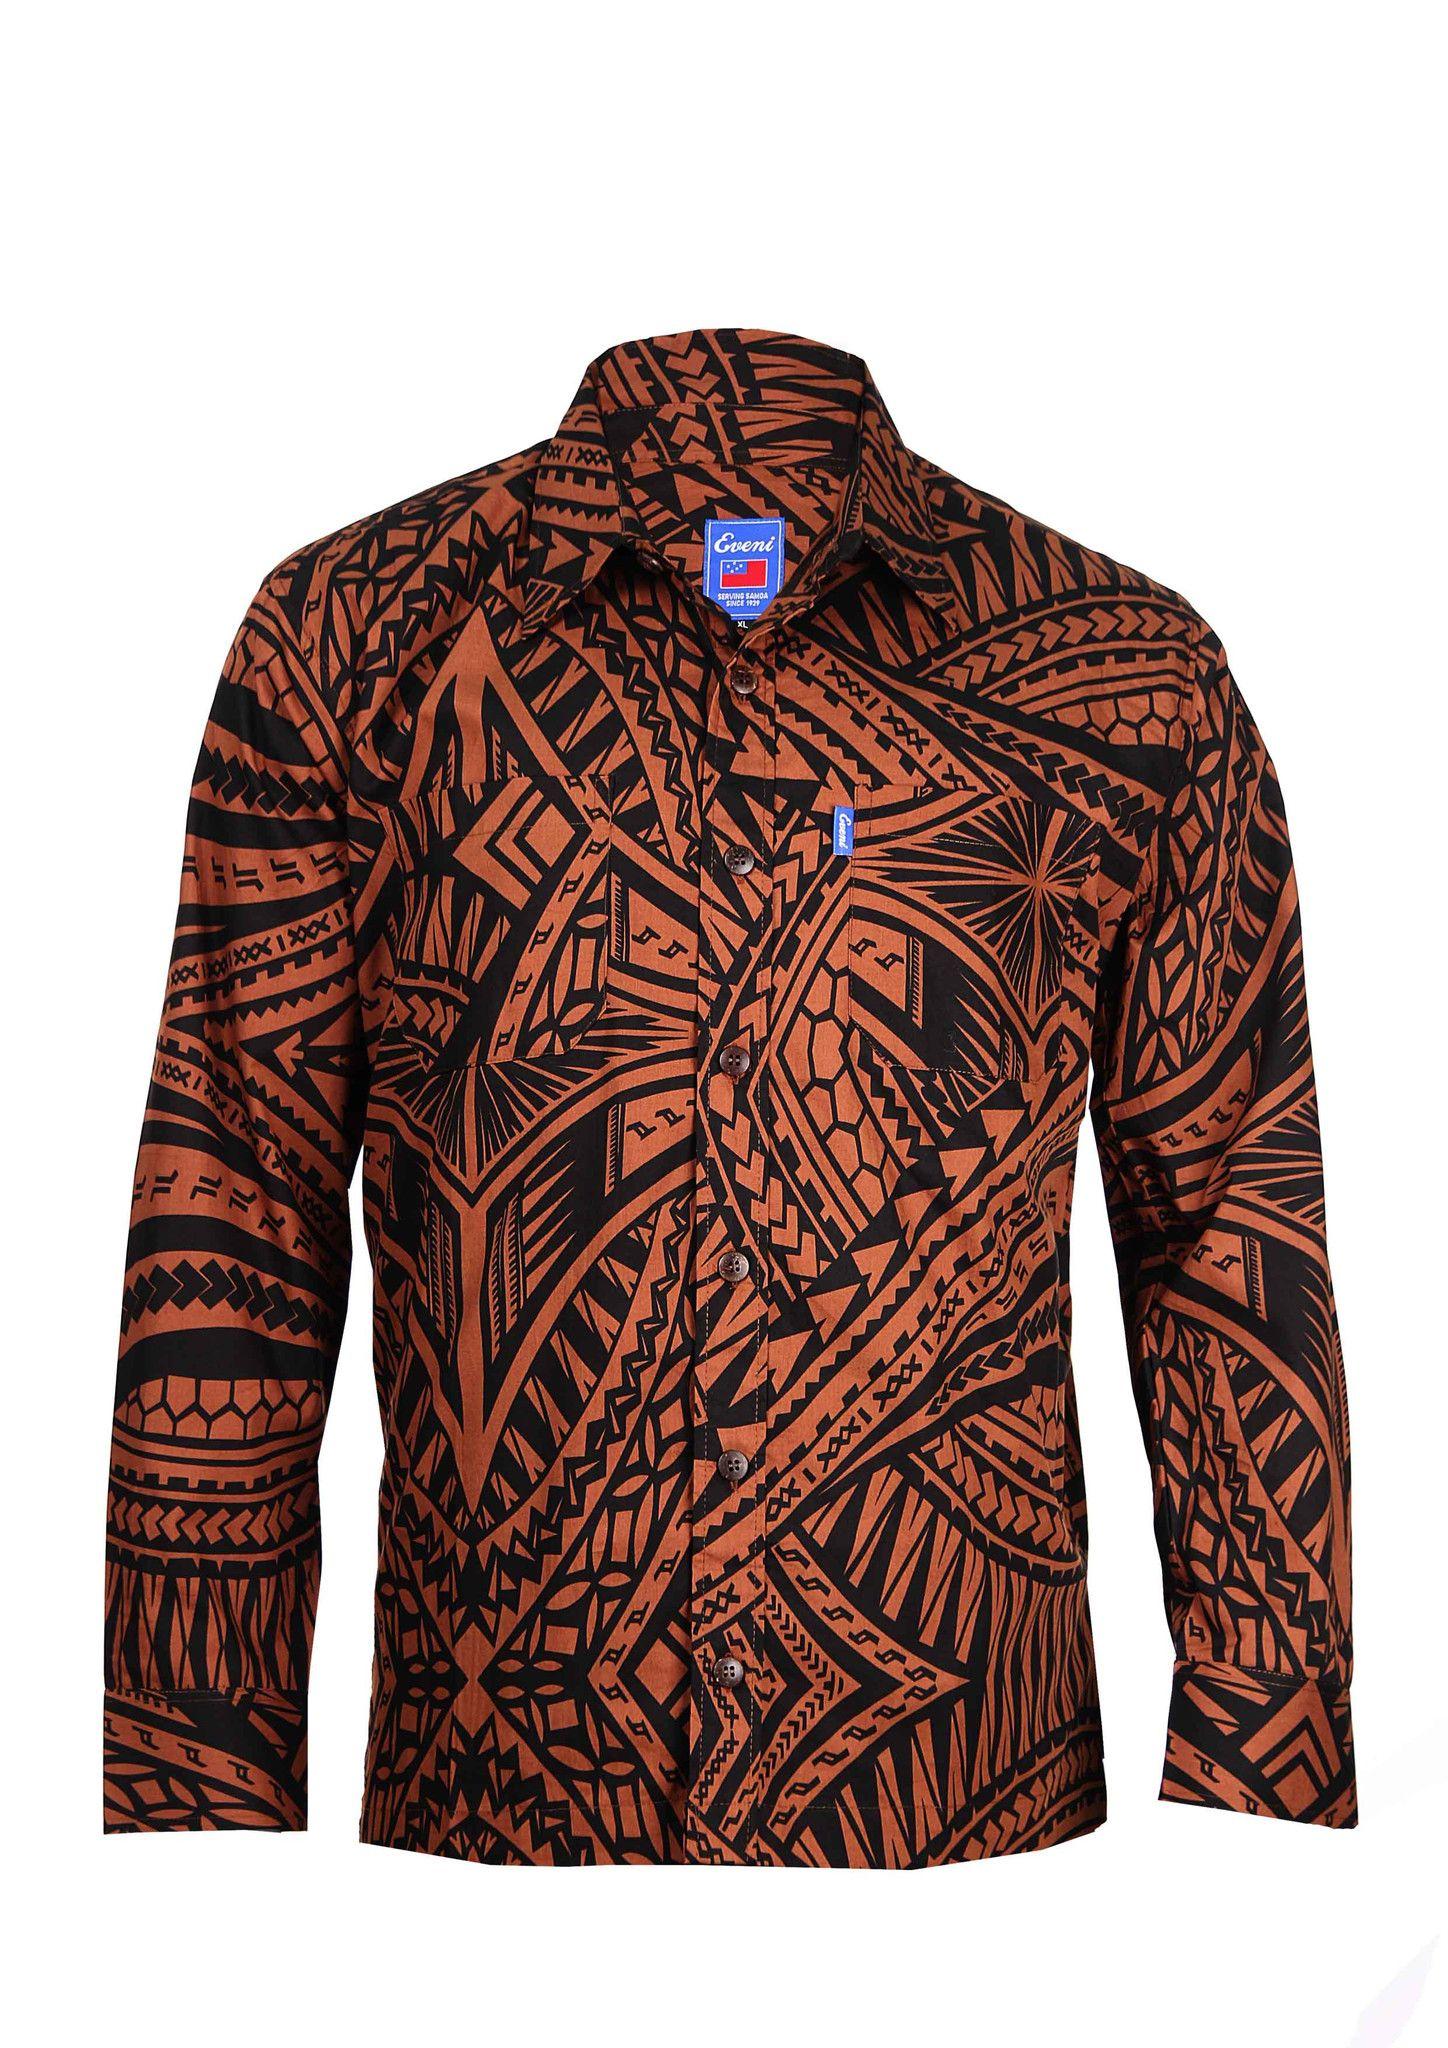 ccf6b9d5cc32e5 Mens Long Sleeve Elei Shirt | Eveni Pacific: Traditional Wear for ...